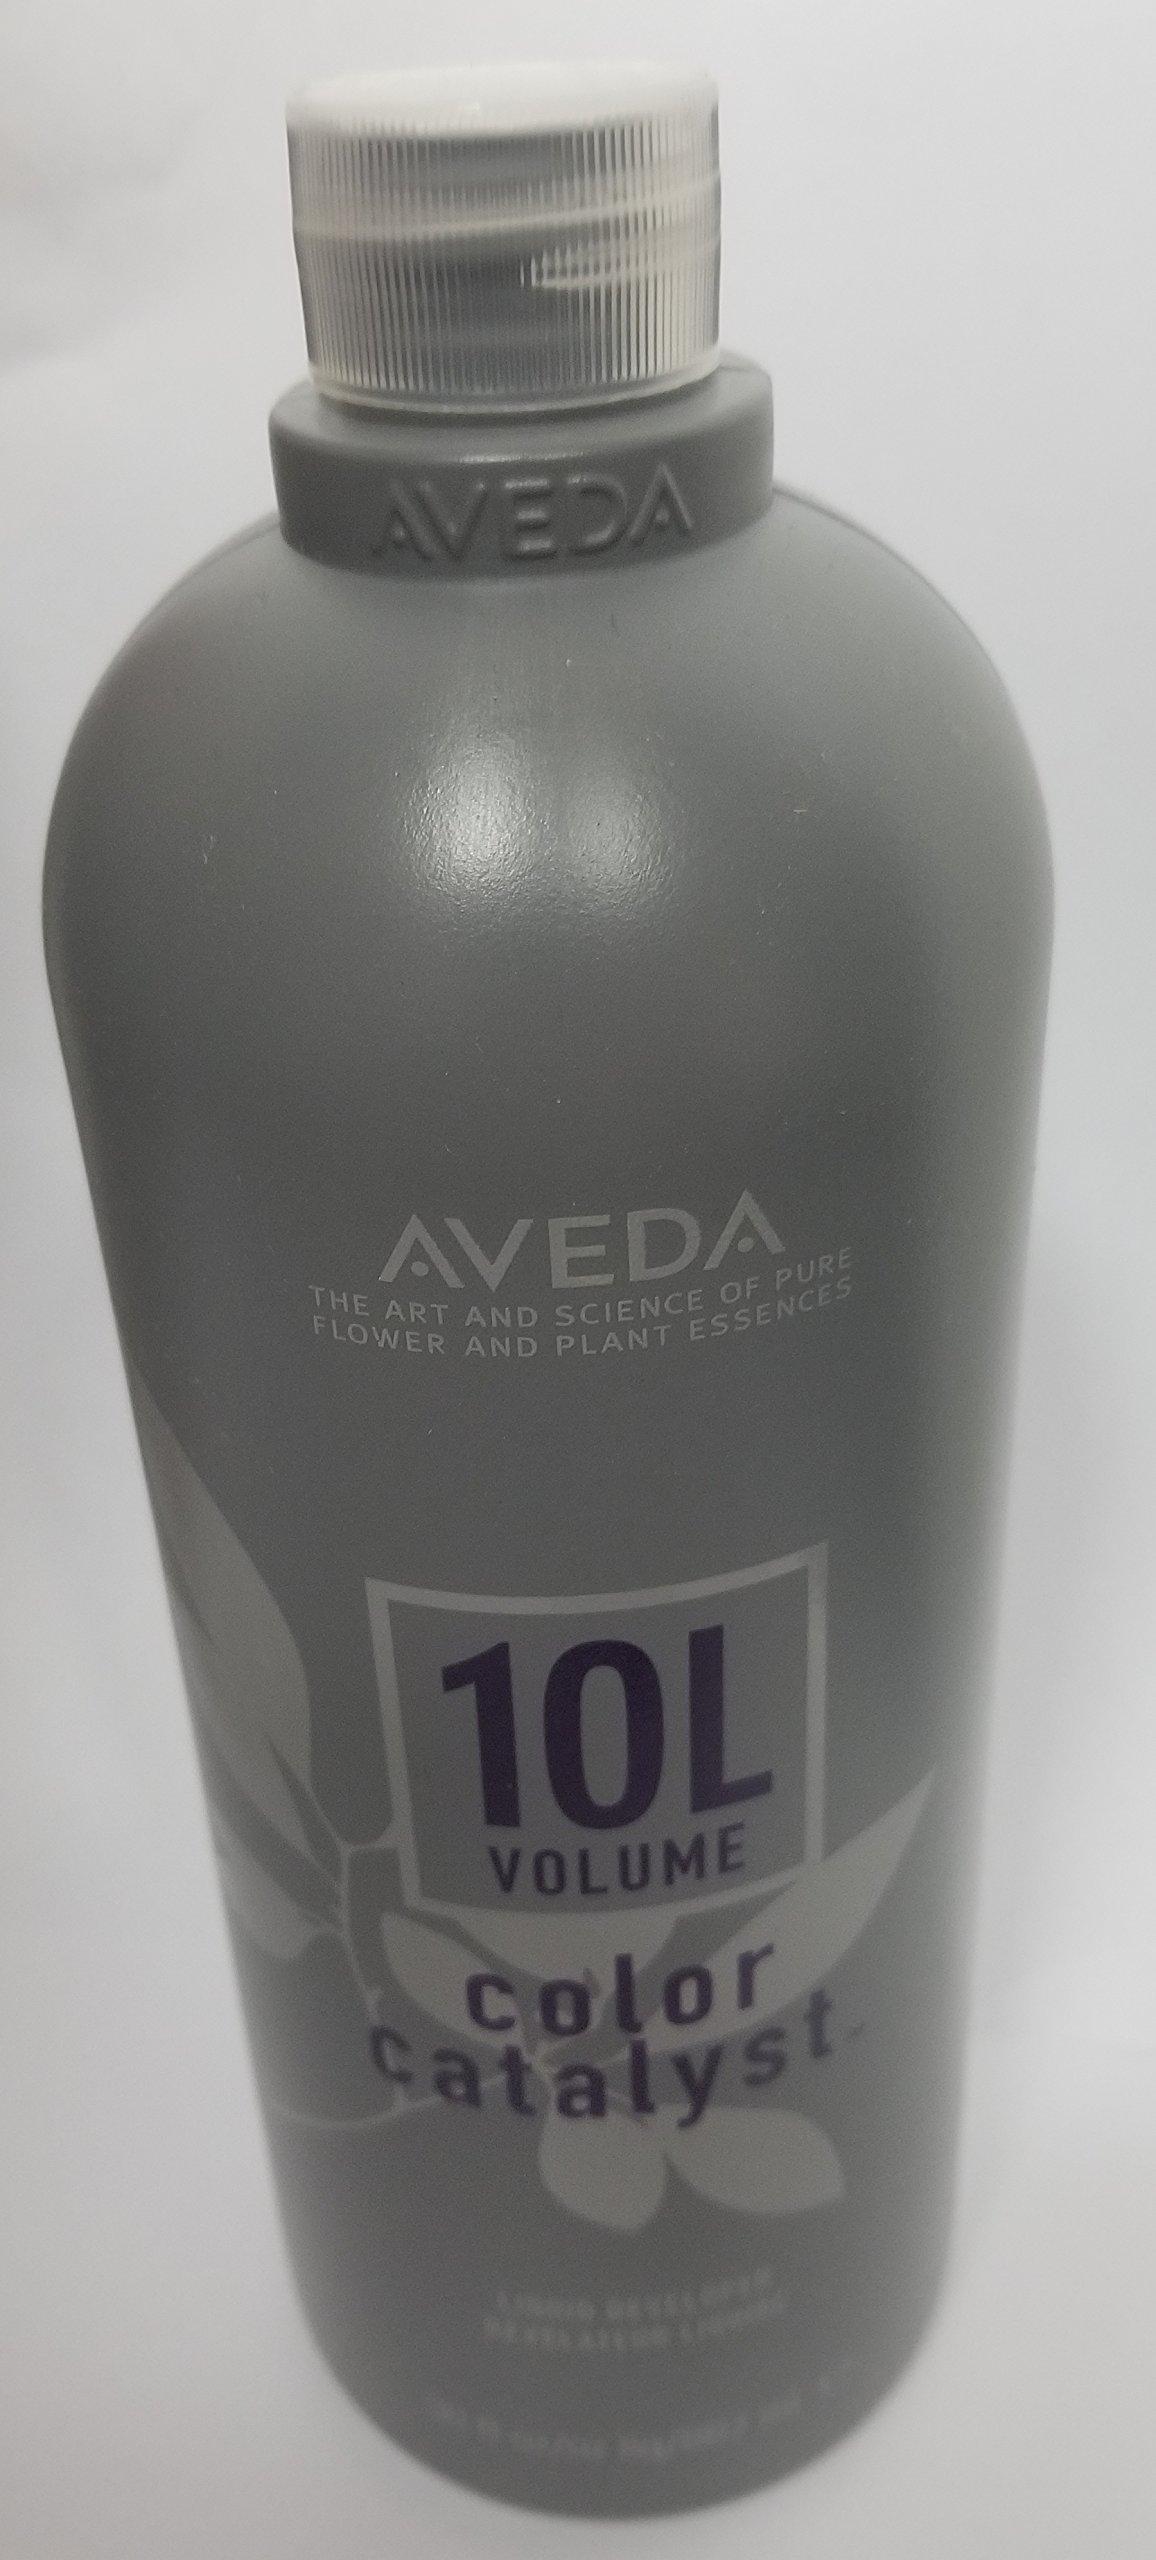 Aveda 10 Volume Color Catalyst Liquid Developer 30 Fl Oz by AVEDA